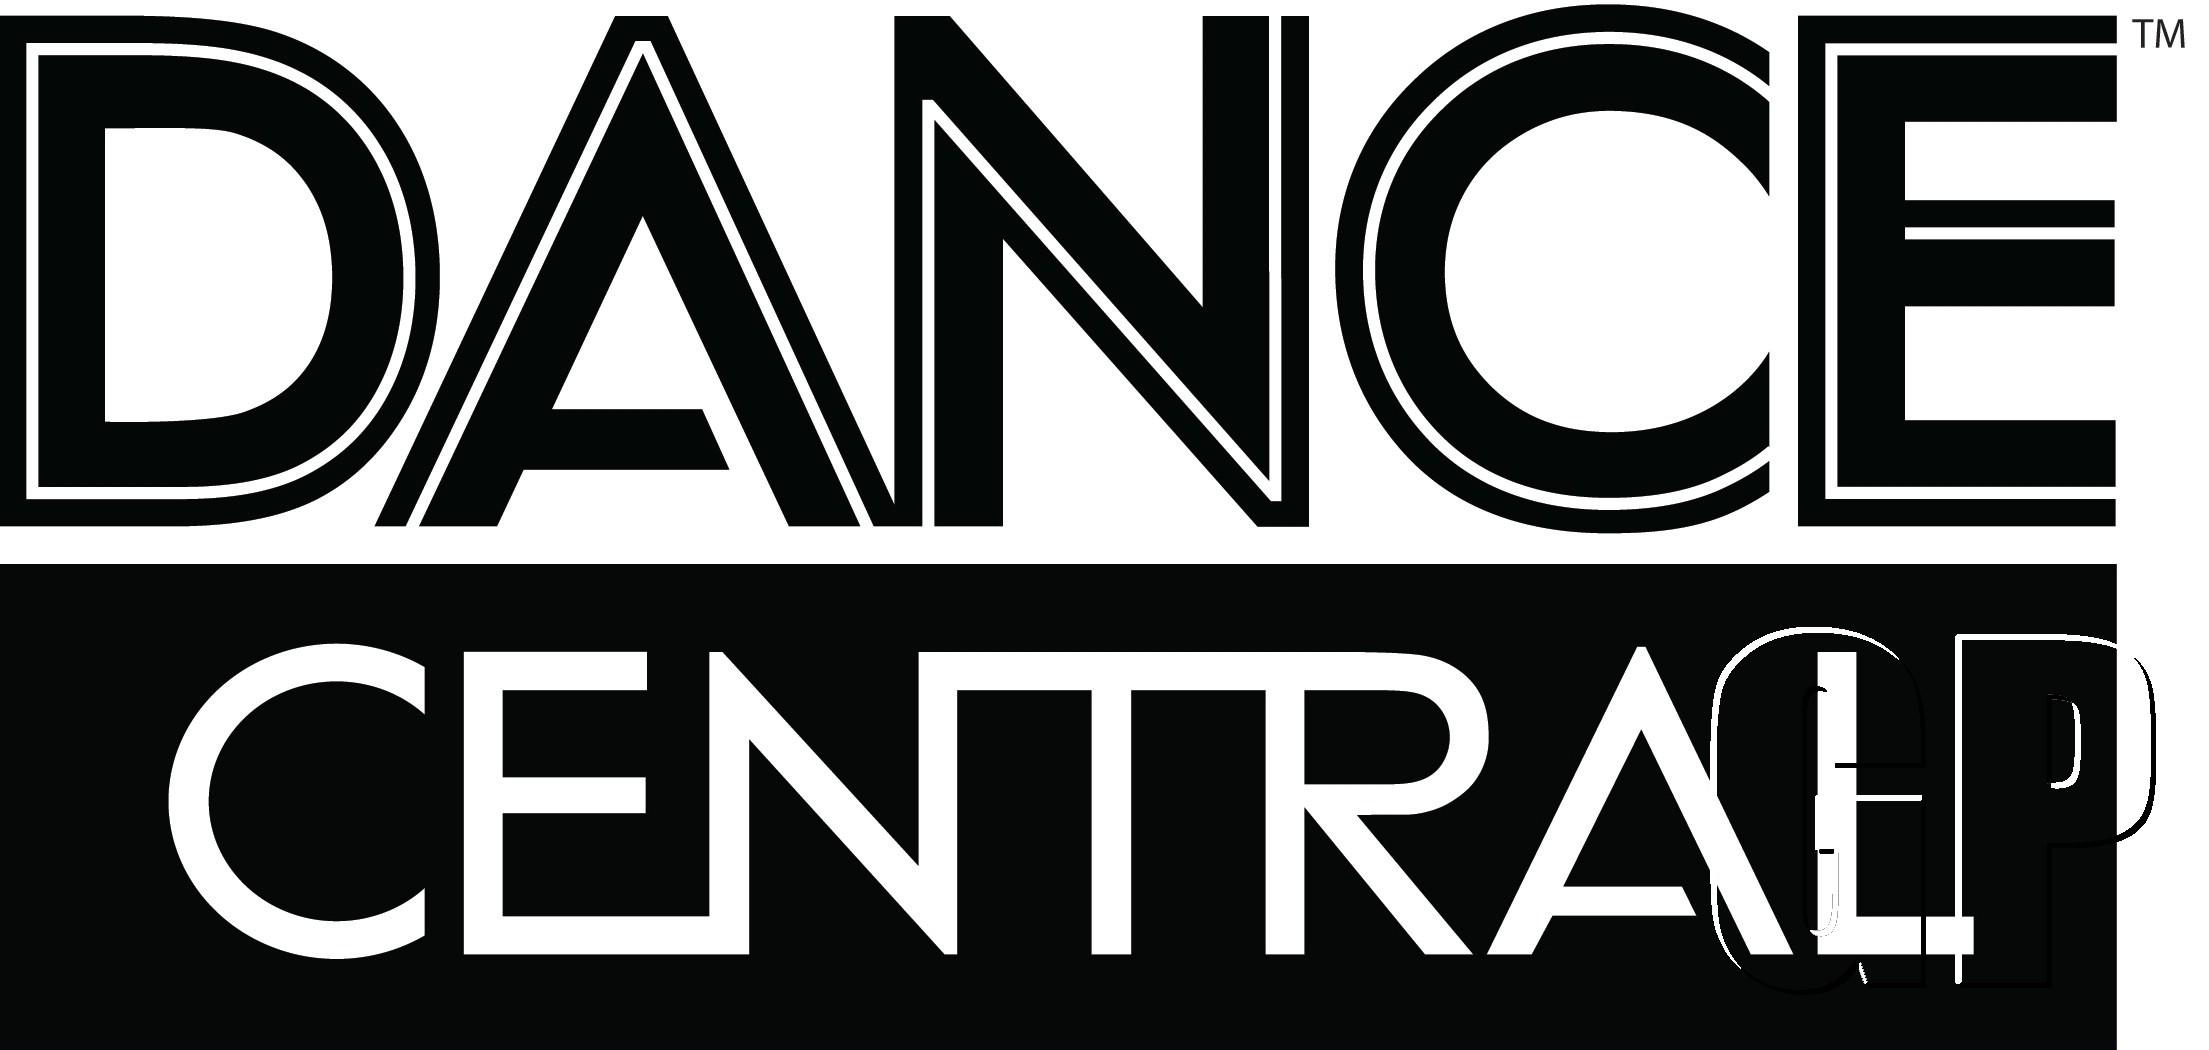 Dance Central E3 2010 The GAMES Blog